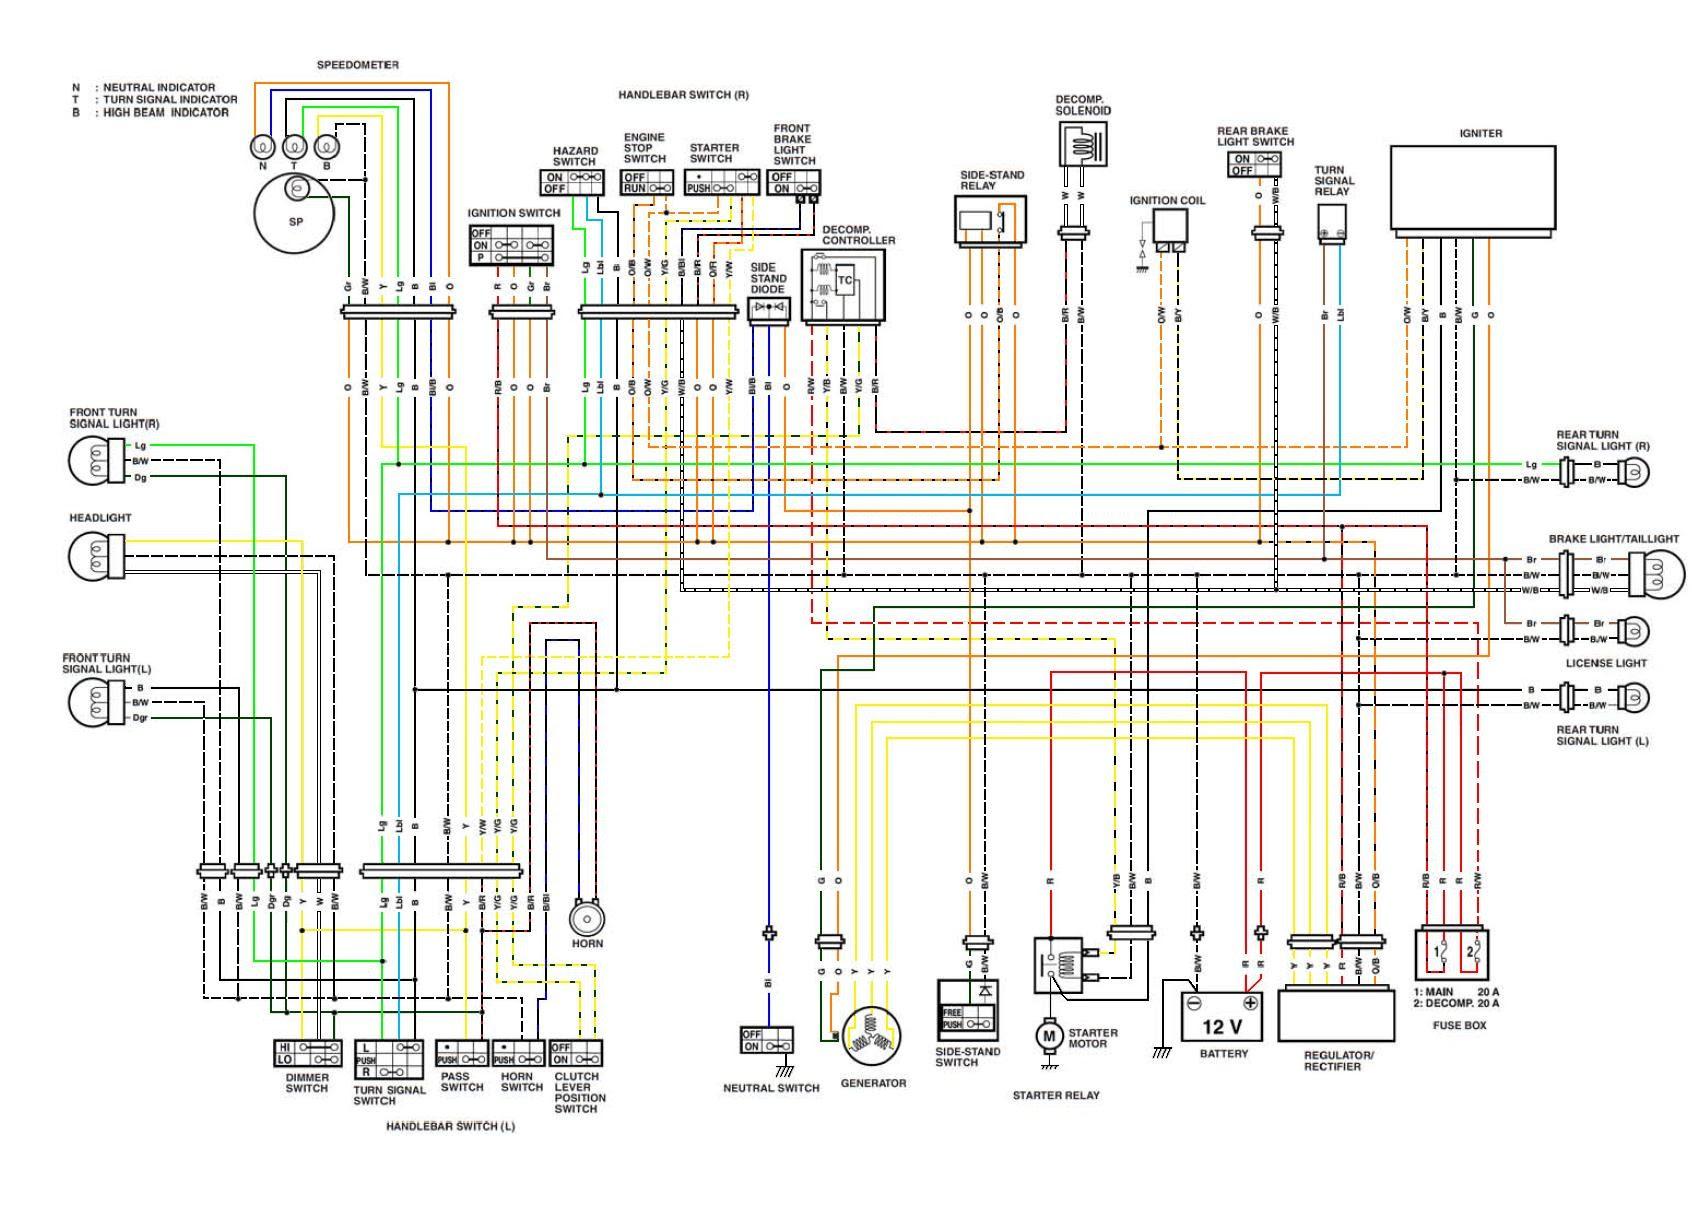 2000 Harley Softail Wiring Diagram Wiring Diagram Log God Build A God Build A Superpolobio It